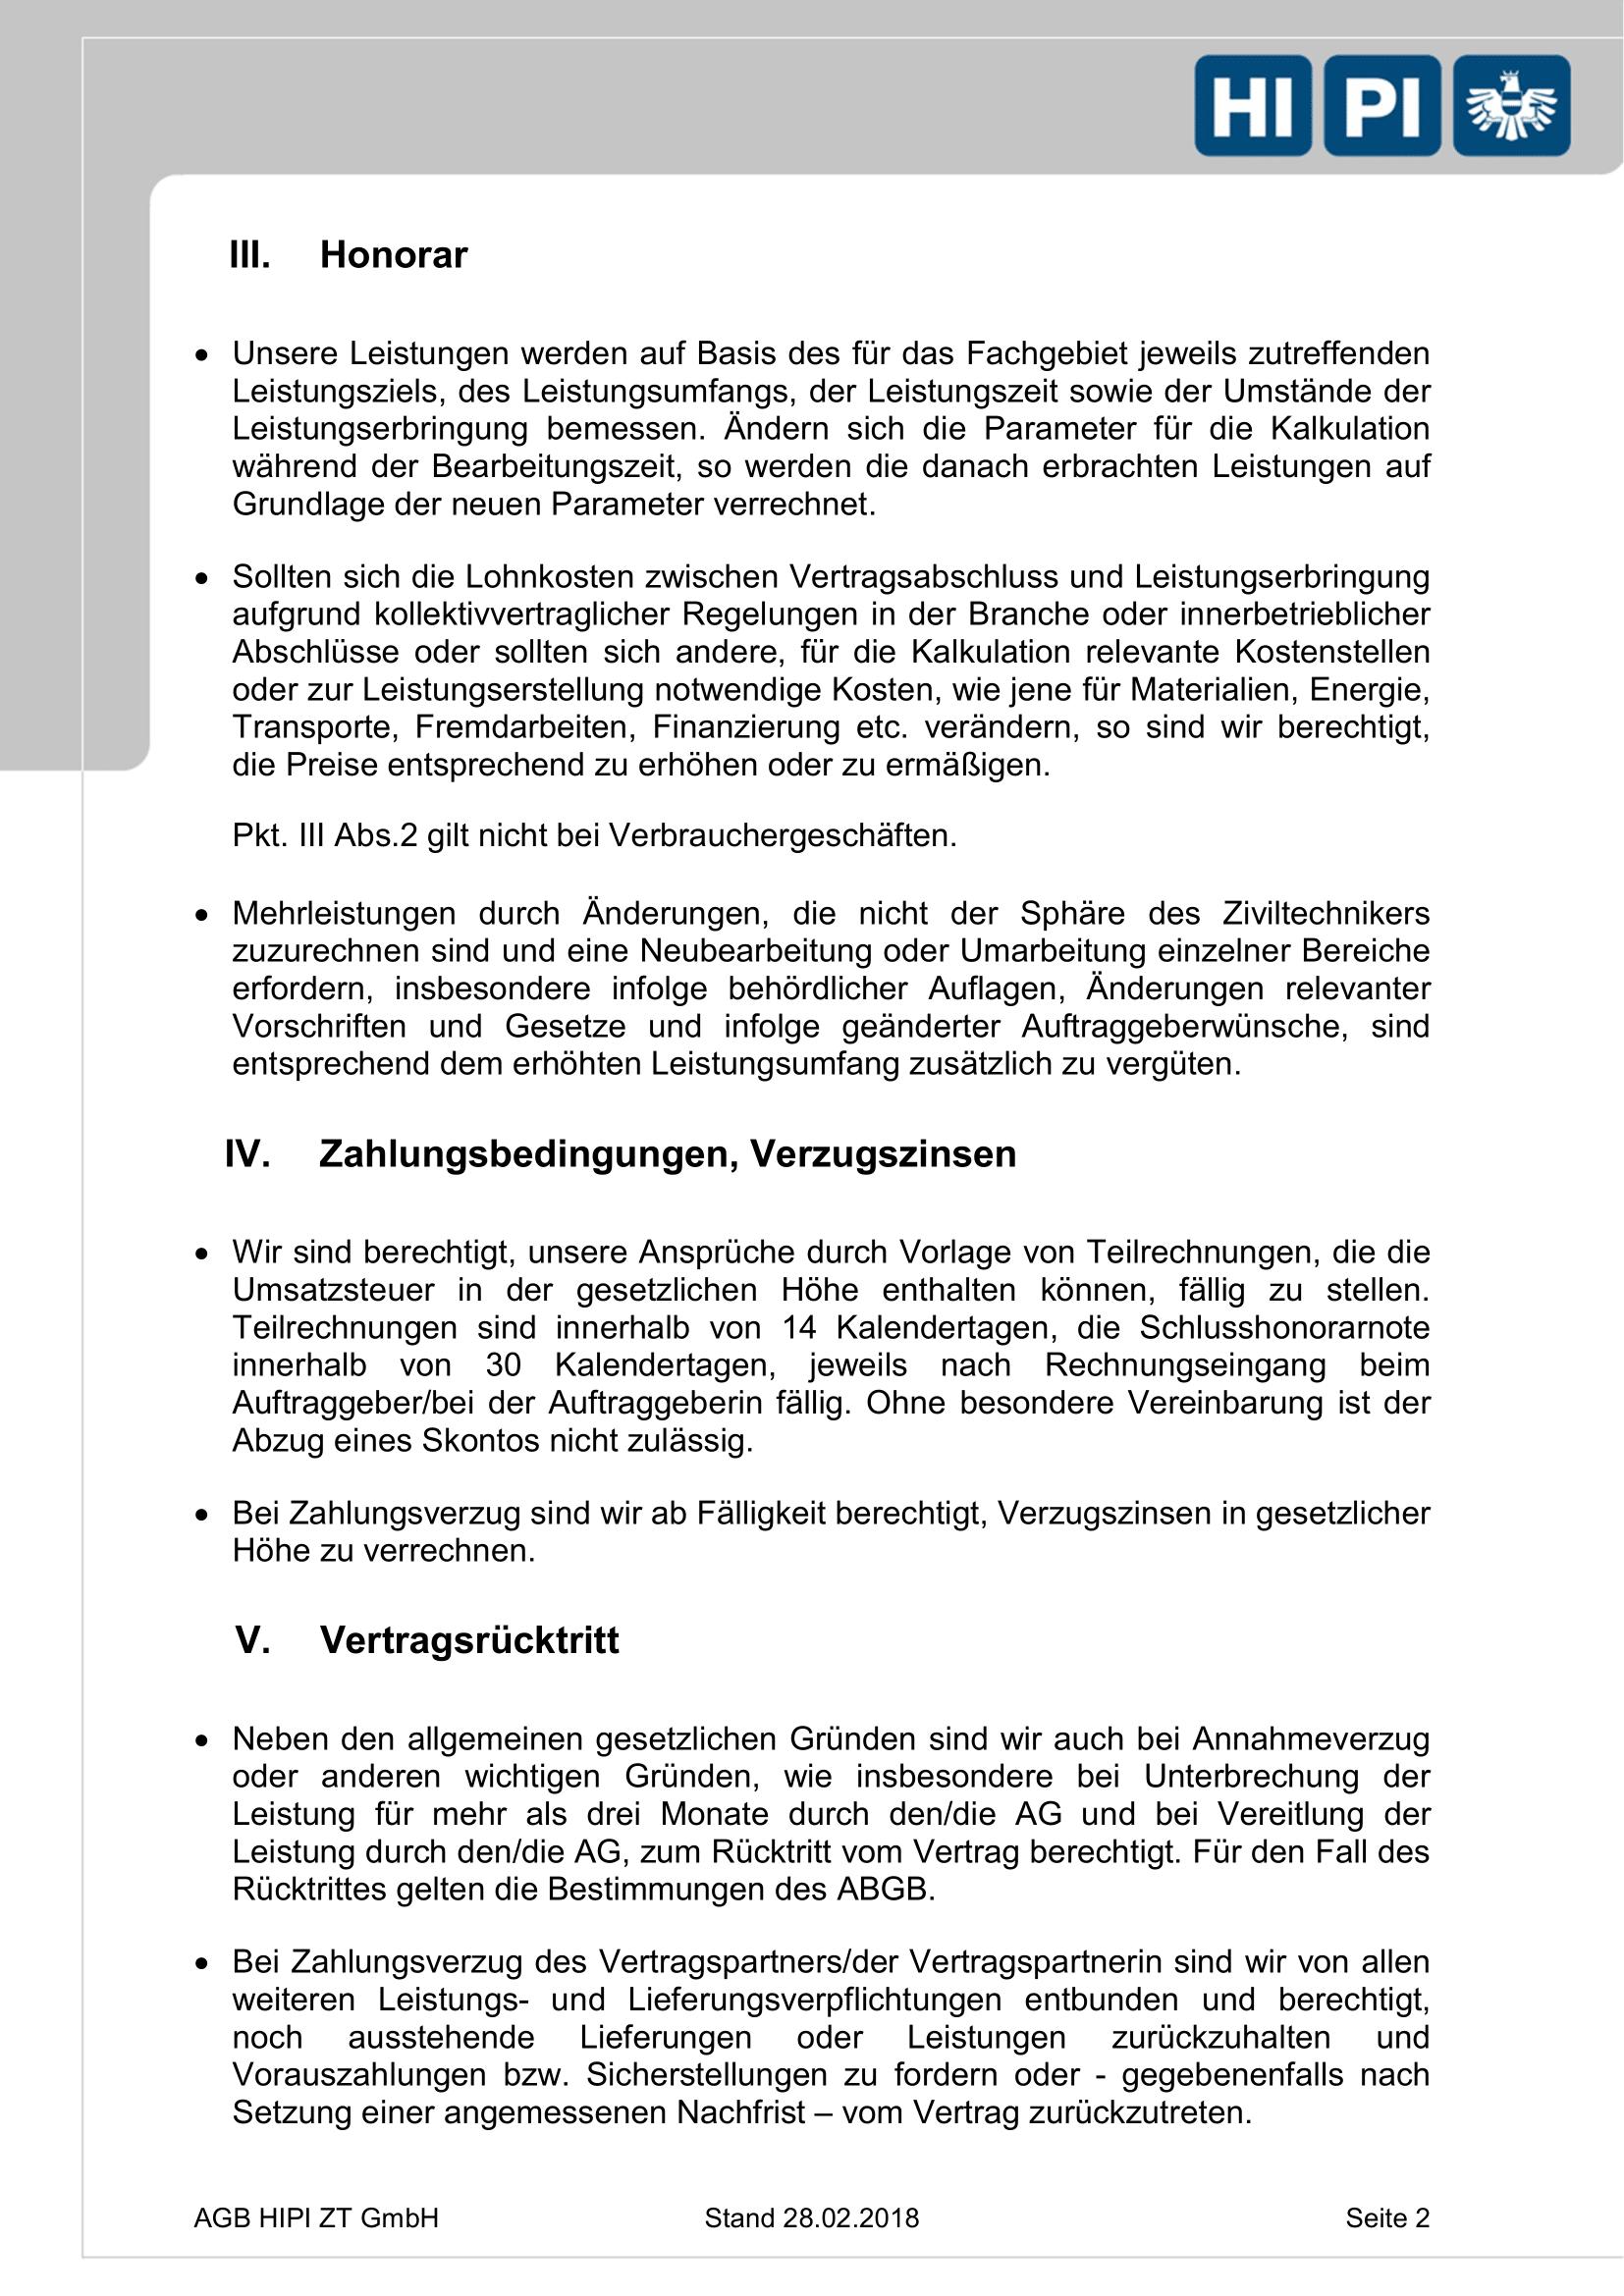 HIPI ZT GmbH AGB Seite 2